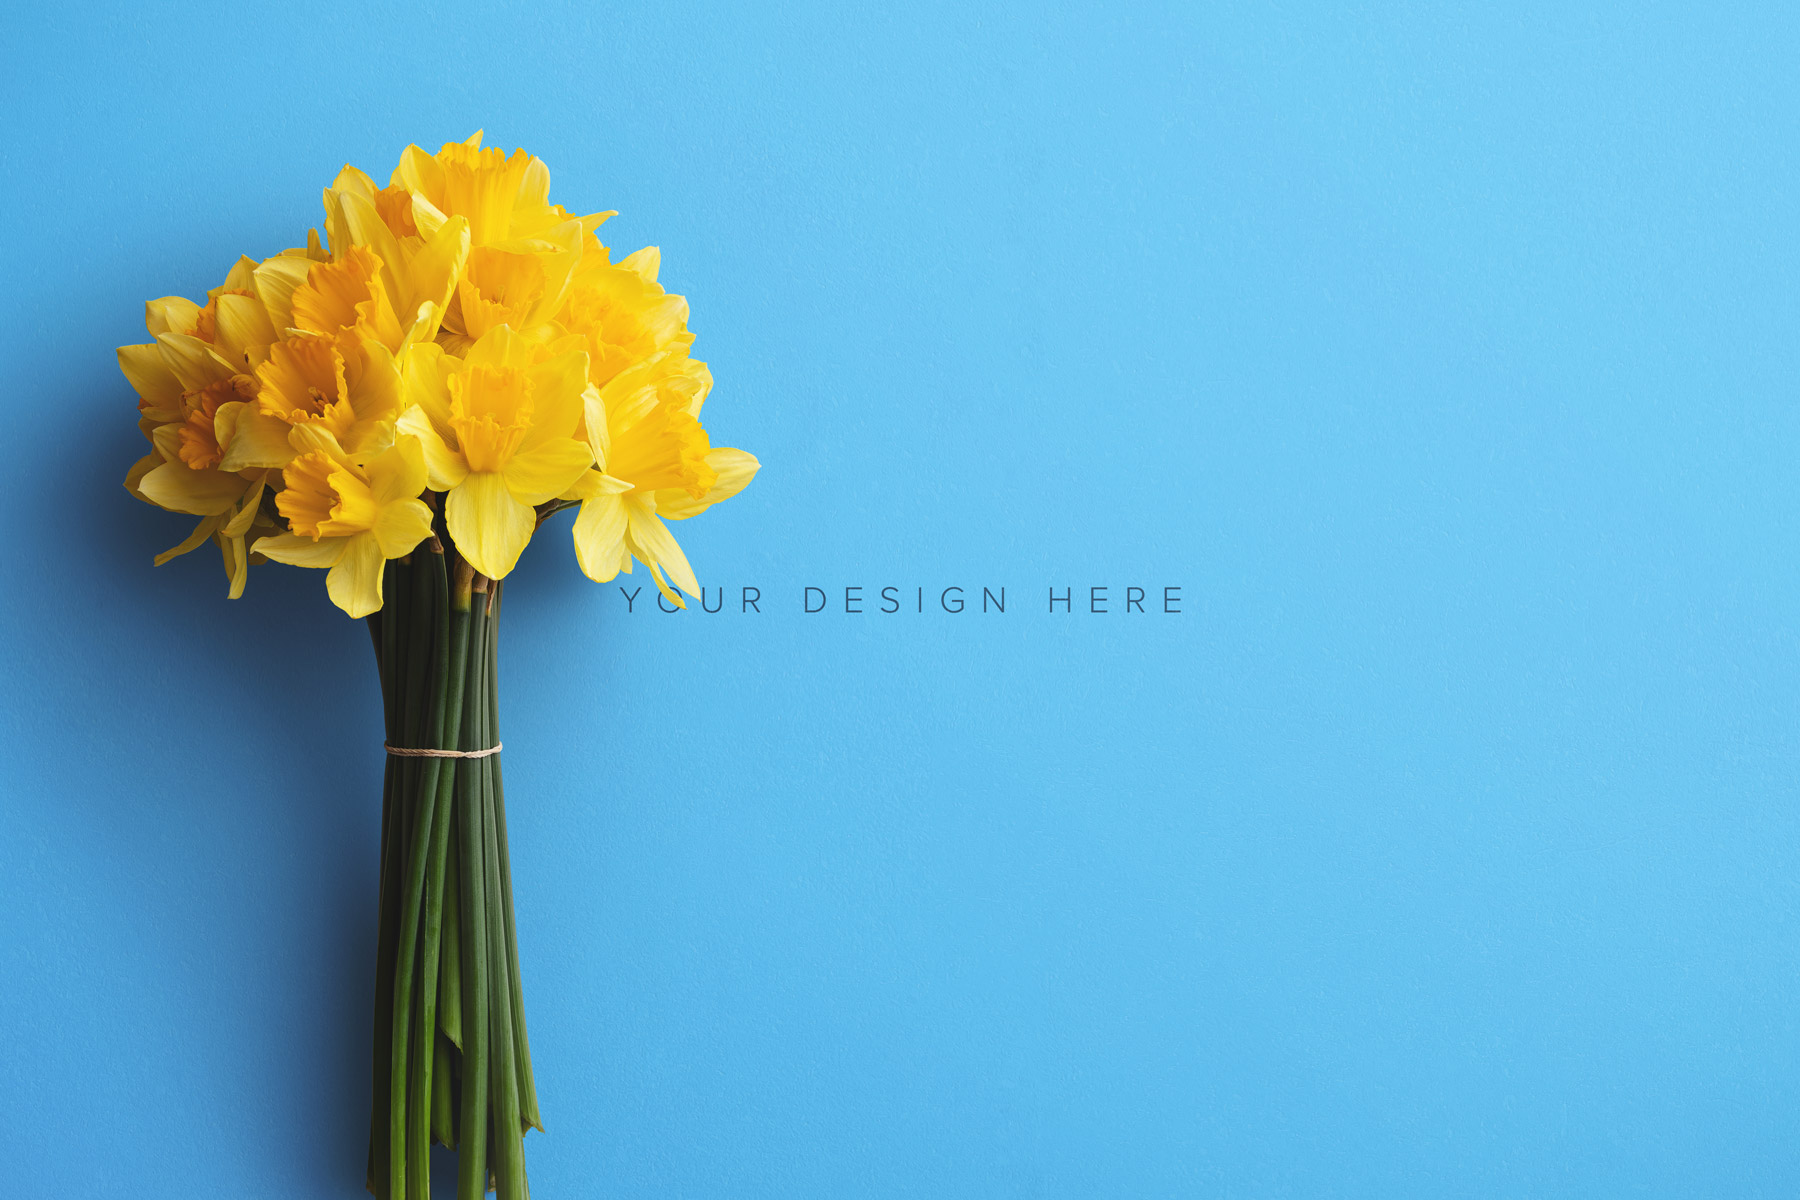 daffodils custom scene creator mockup 3